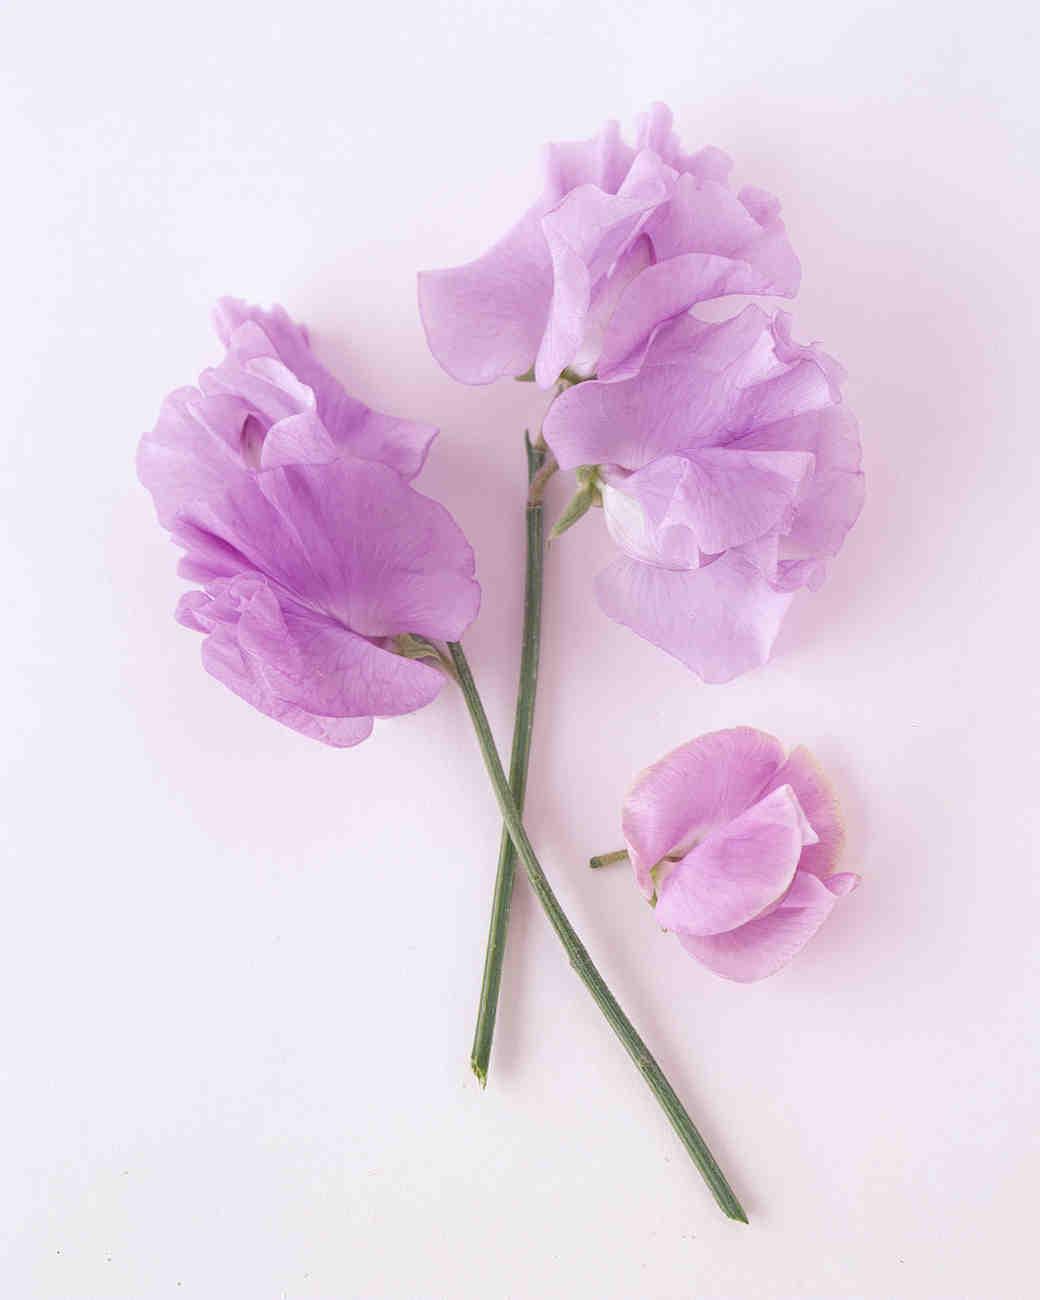 flower-glossary-sweet-pea-purple-a98432-0415.jpg